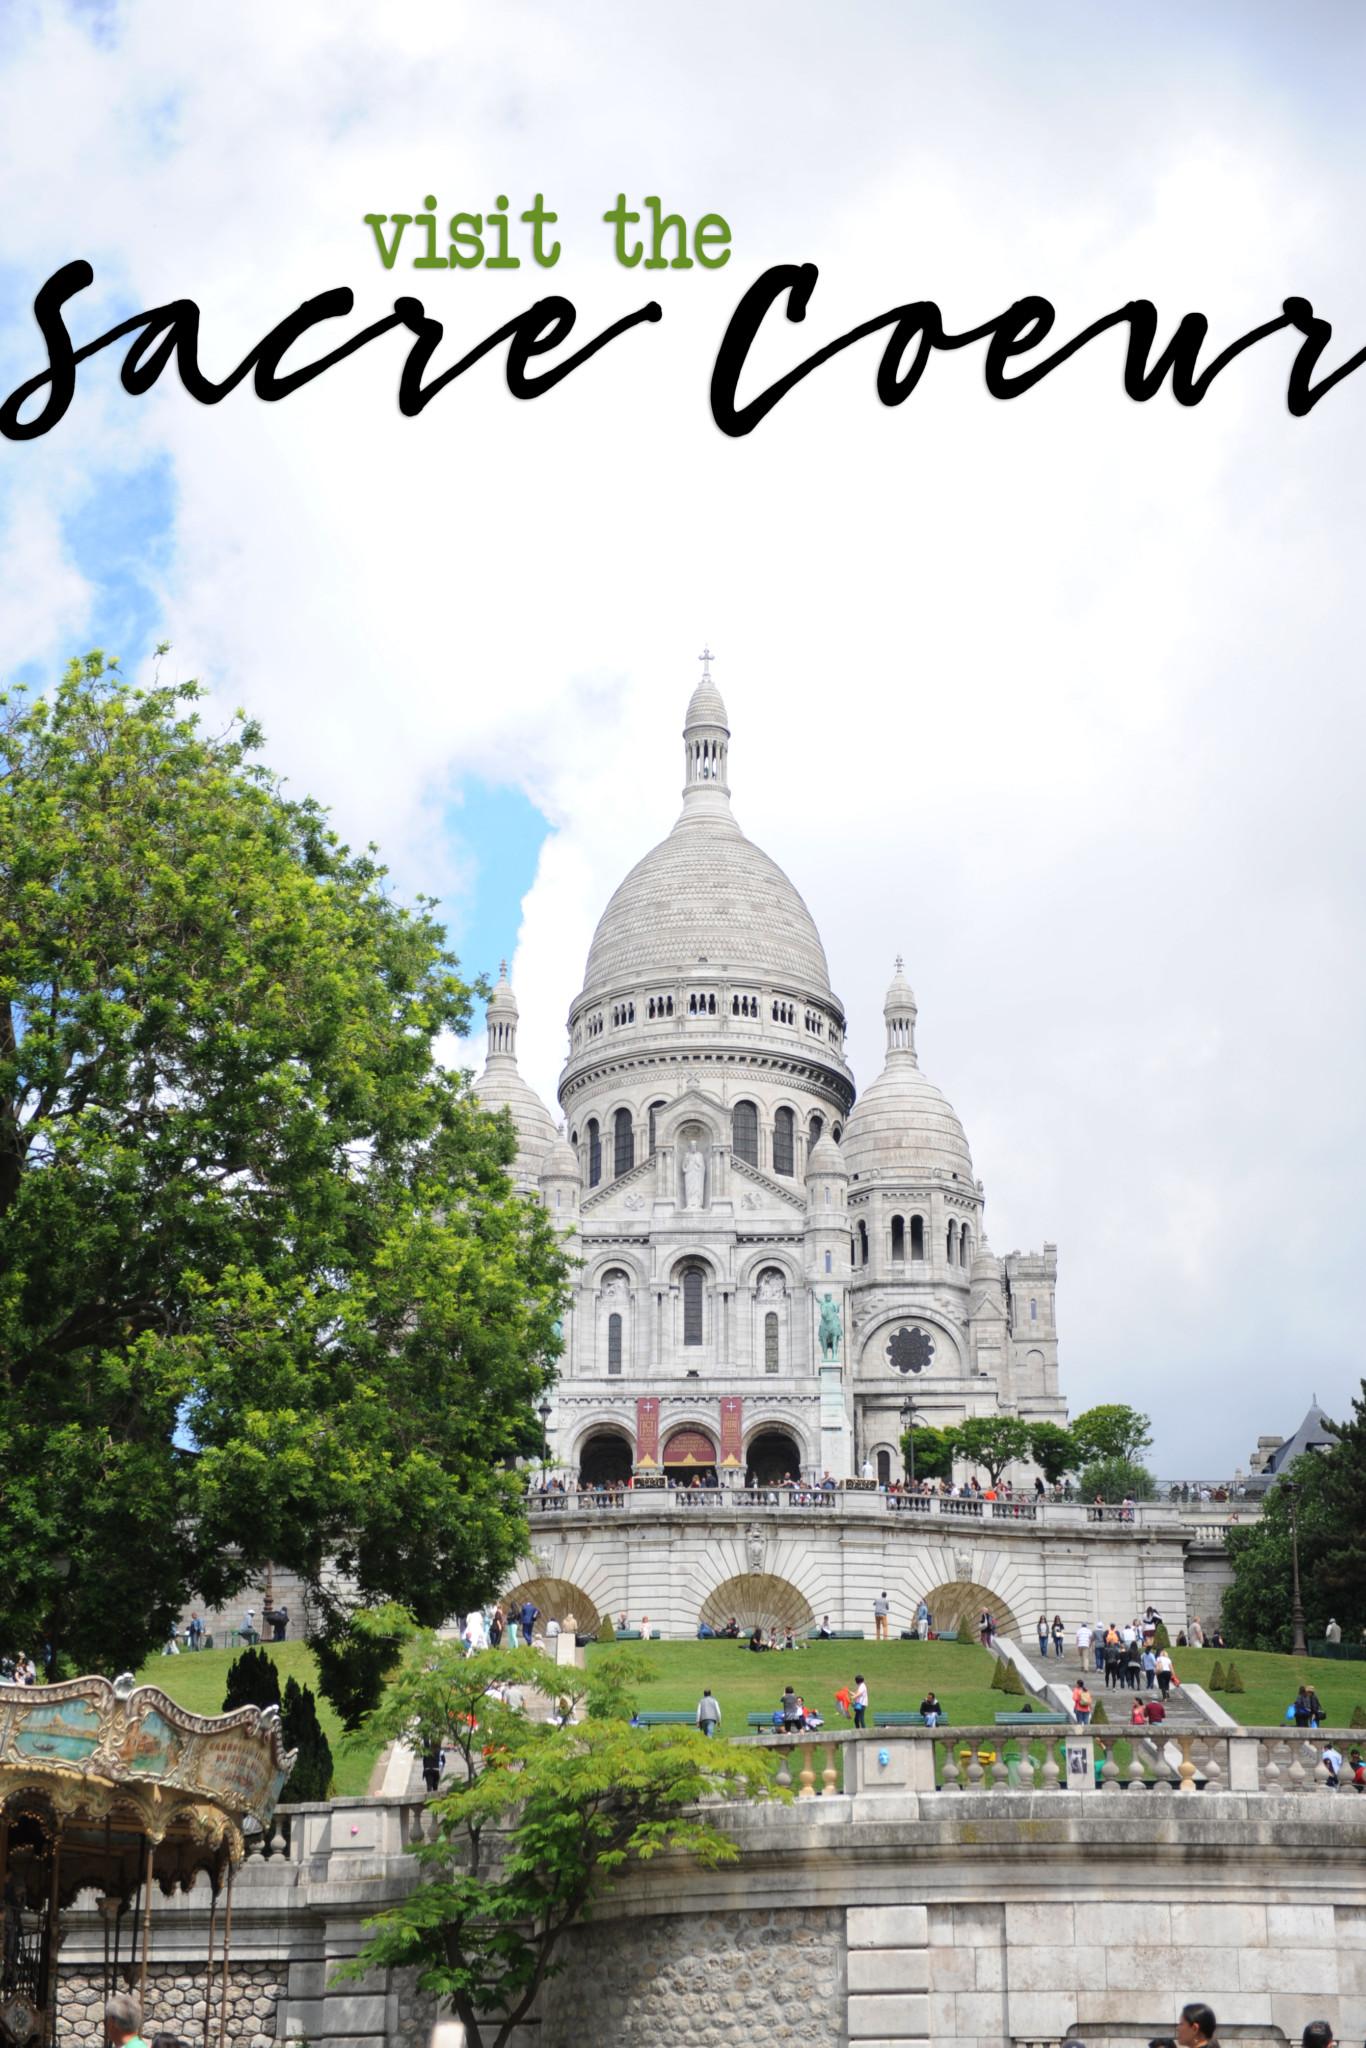 Visit the Sacre Coeur